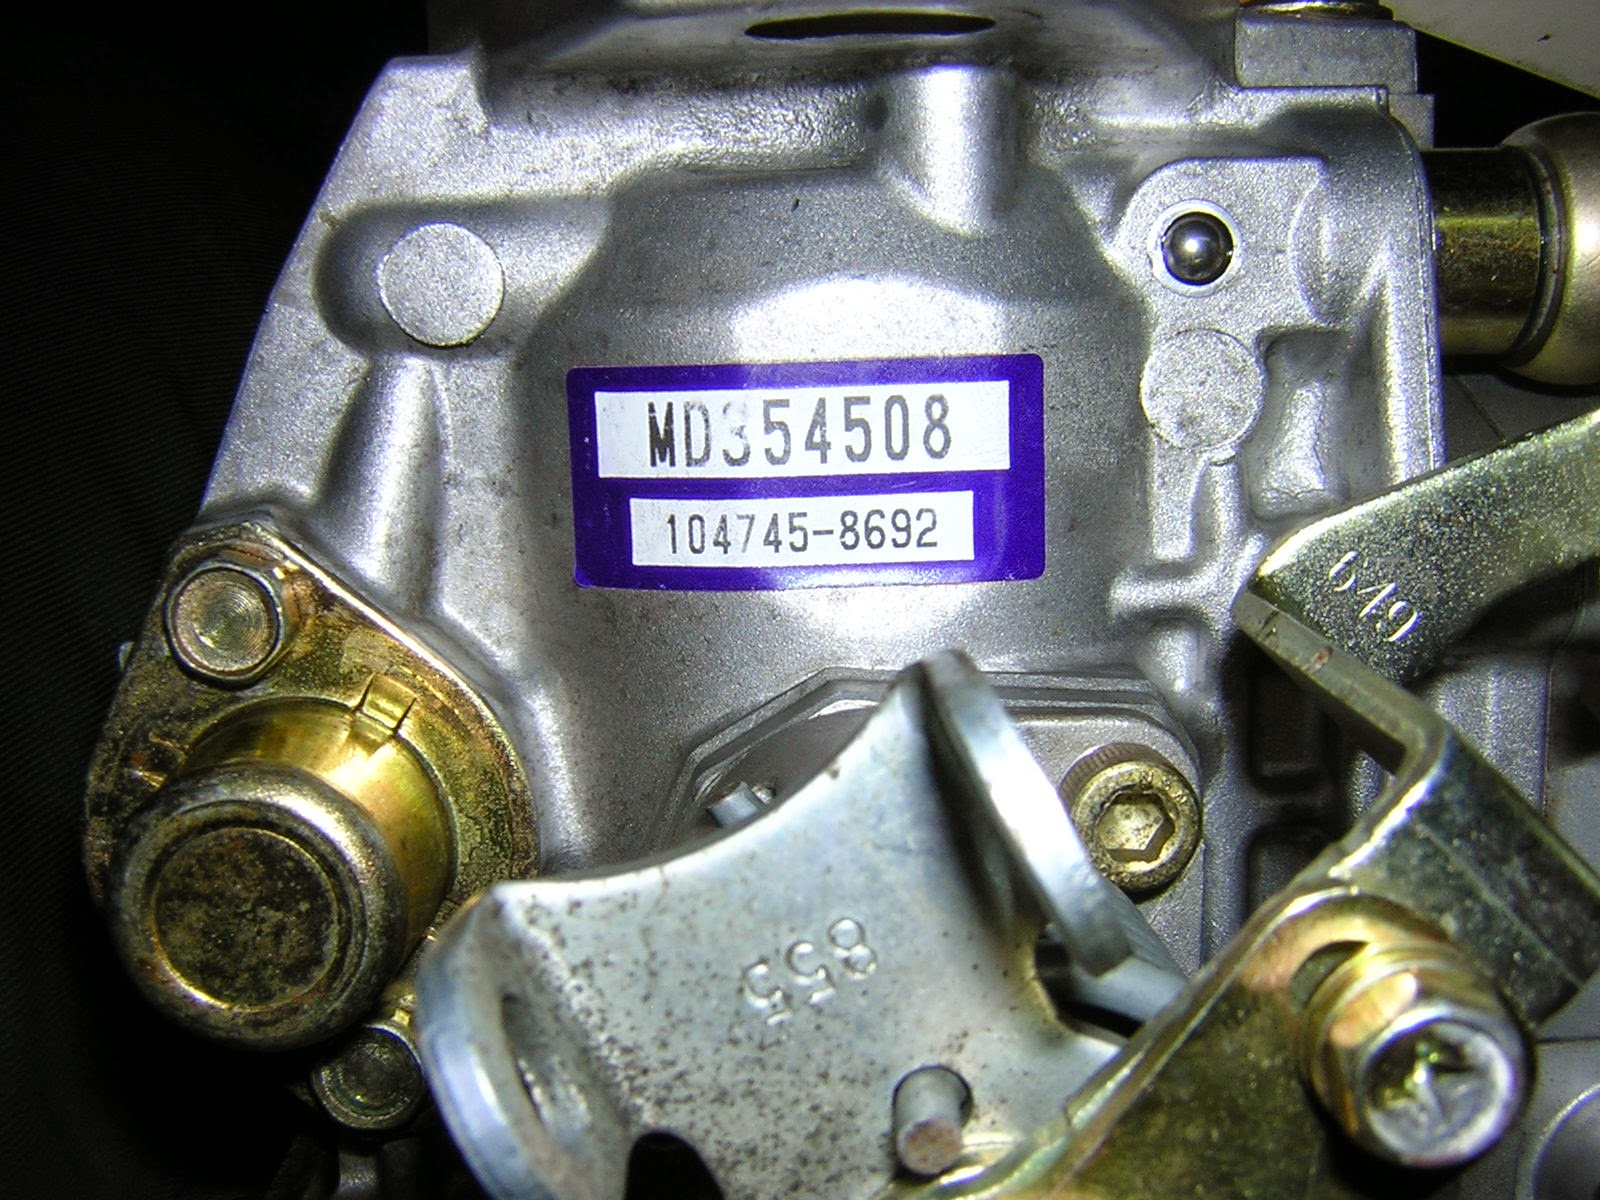 MD354508